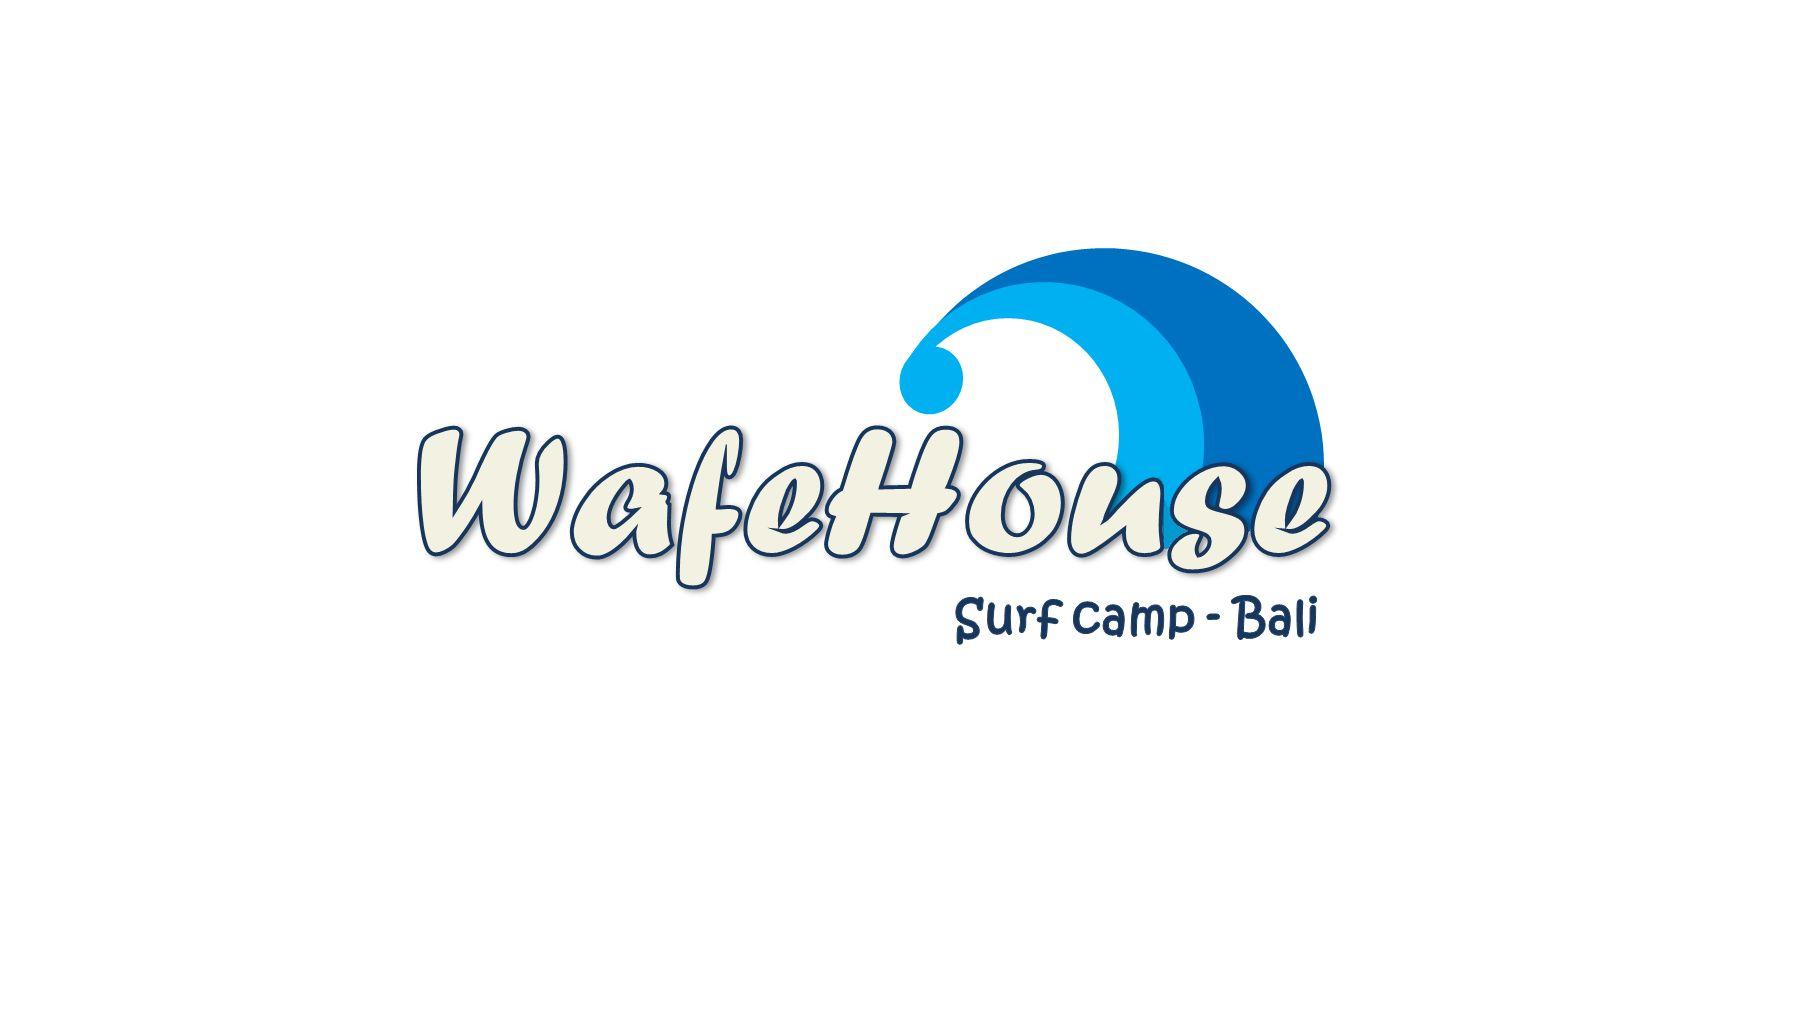 Редизайн логотипа для серф-кэмпа на Бали - дизайнер k-hak